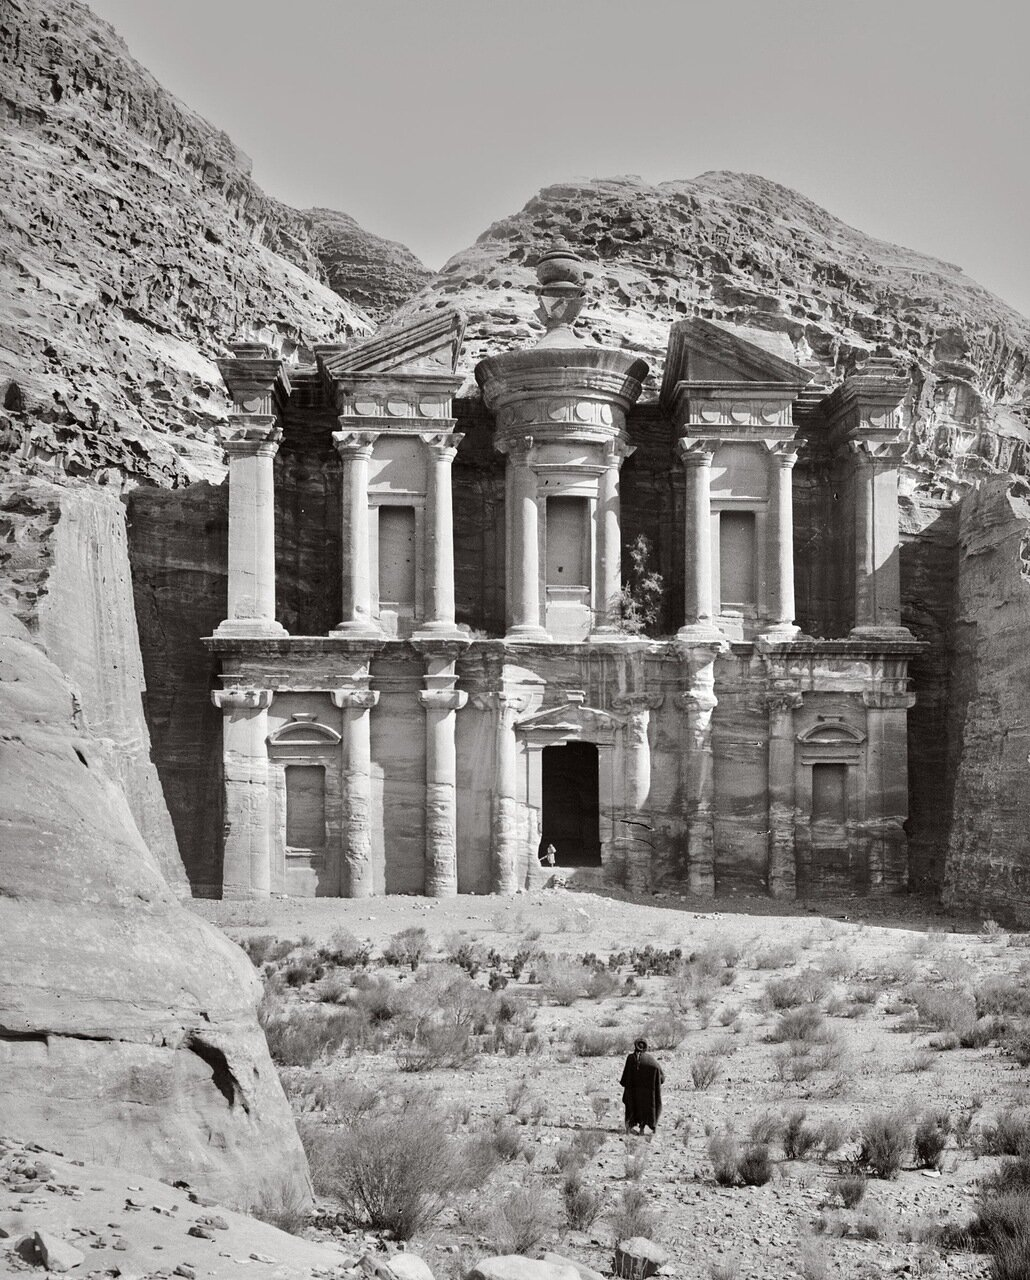 Петра в Трансиордании. Храм Эд-Дейр. 1900-1920 гг